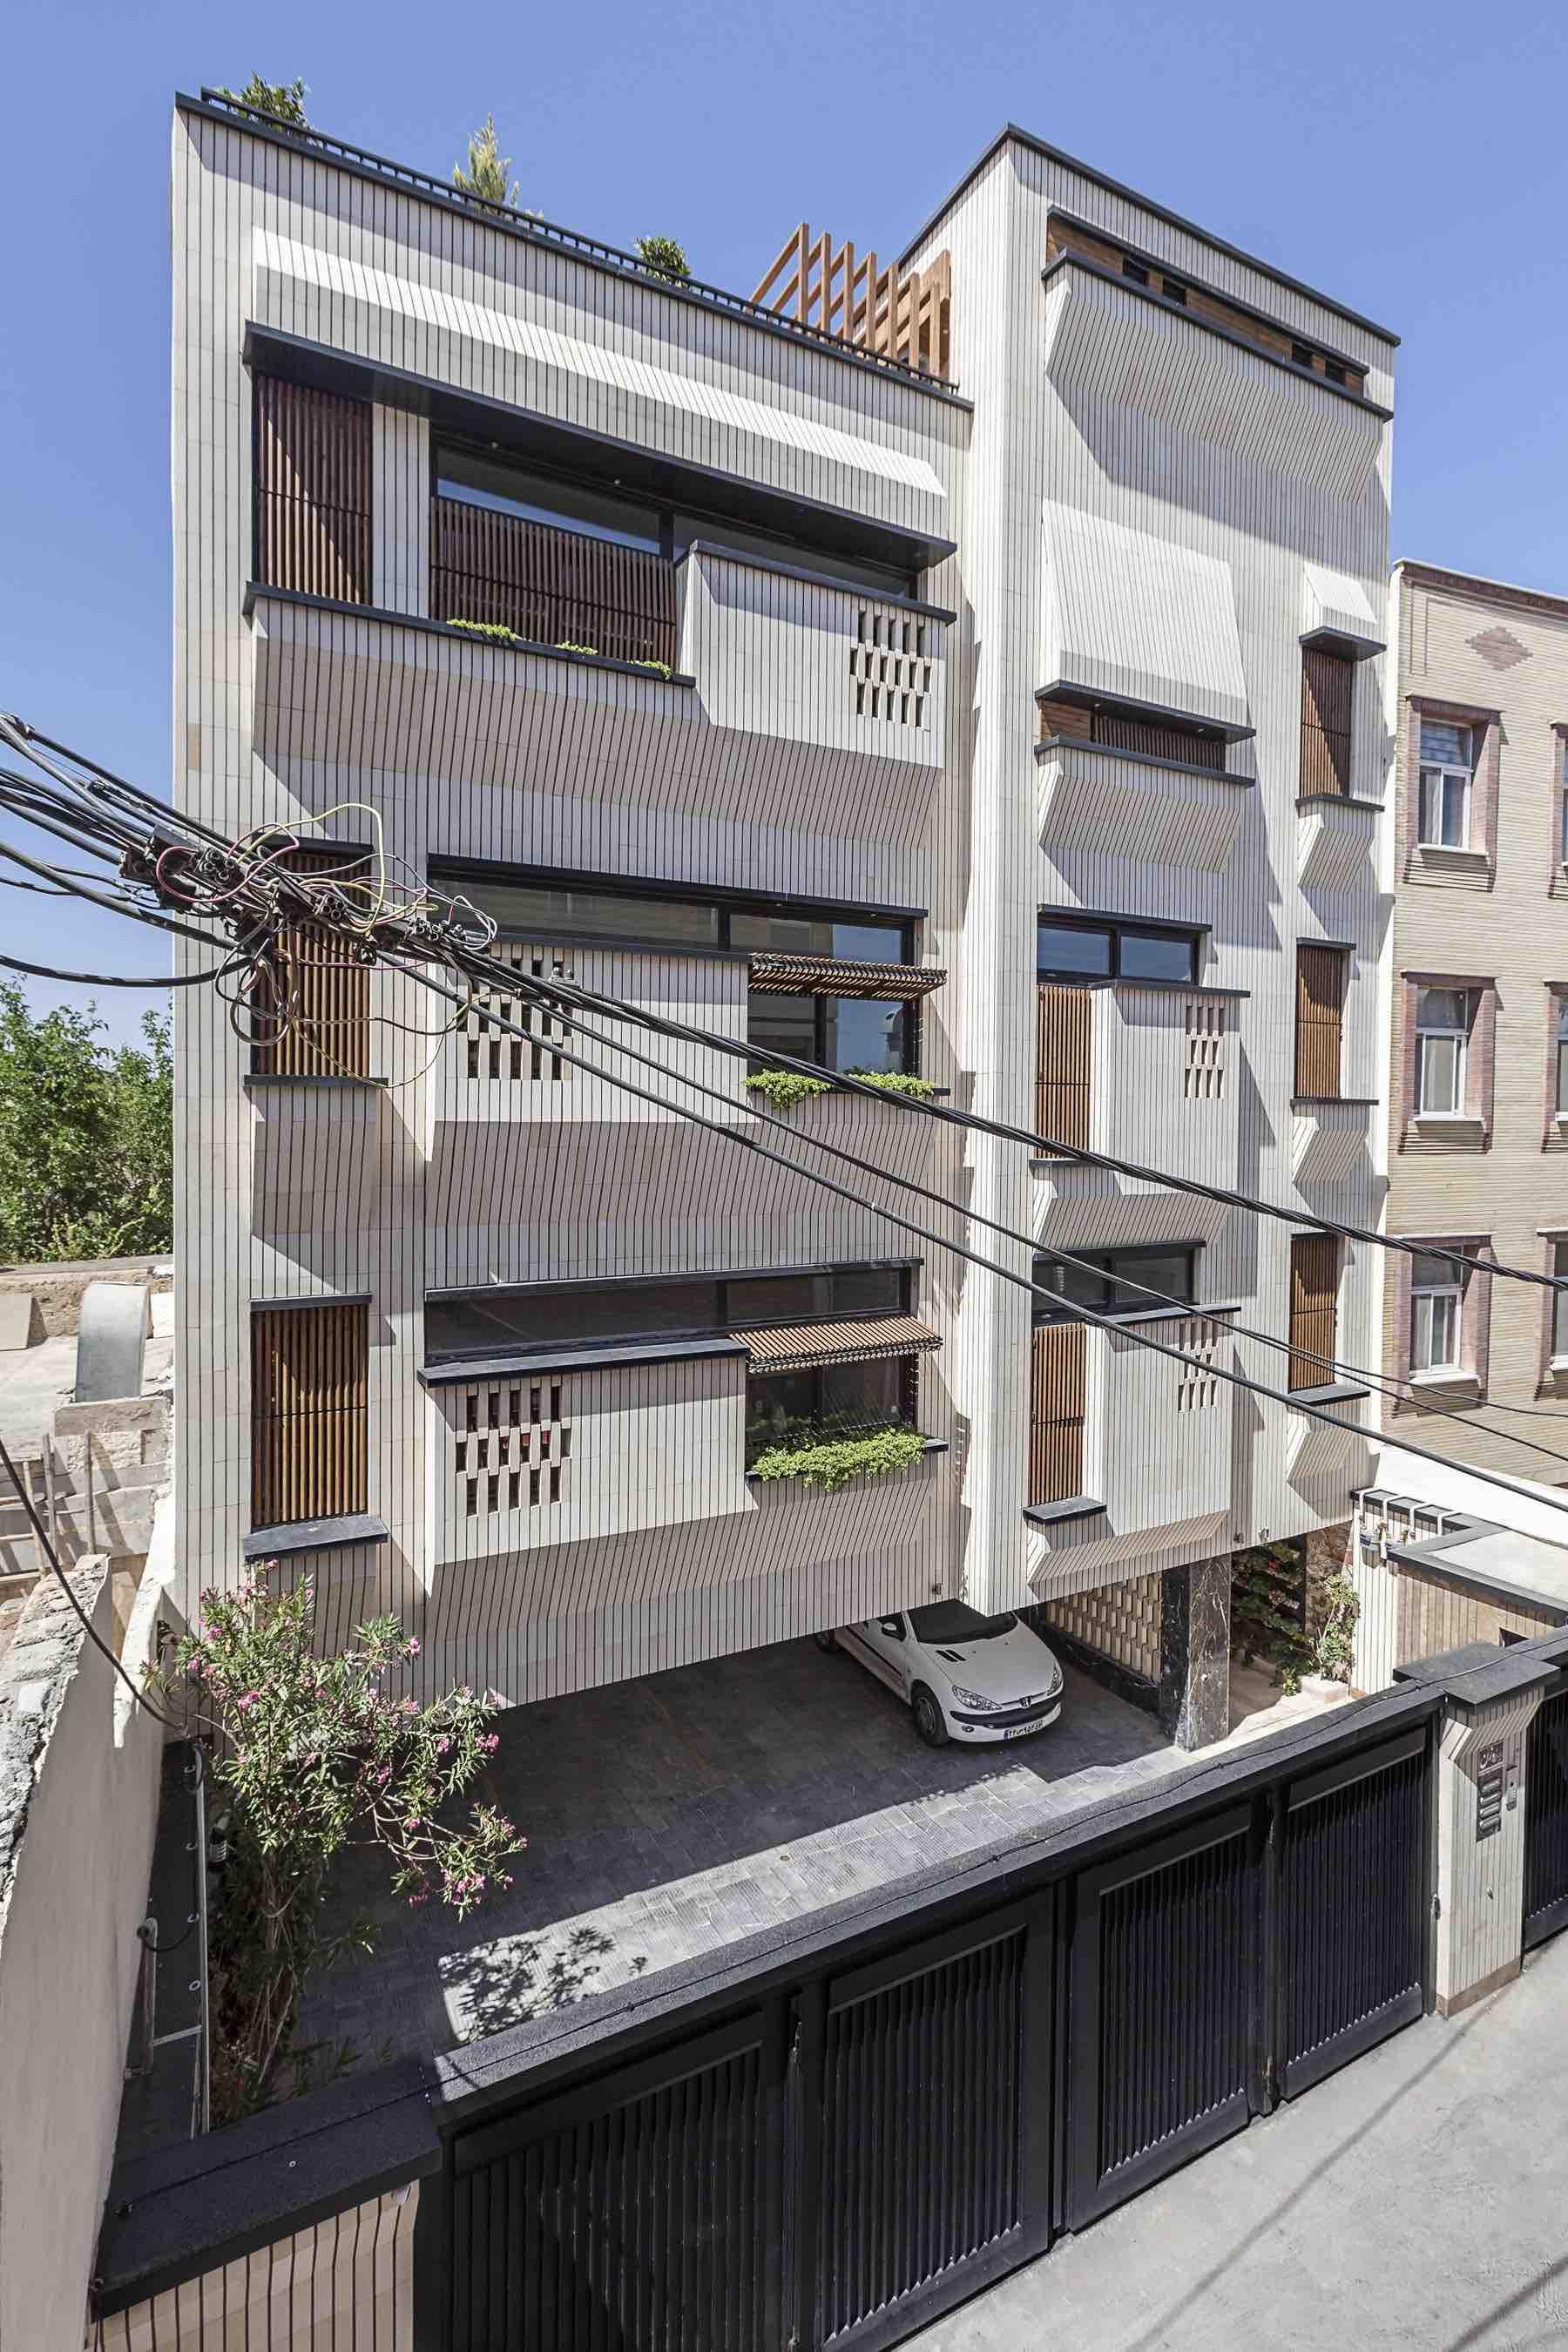 Rouzan_Residential_Building_Sayed_hamed_jafari_Charchoob_Architecture_Office_002.jpg